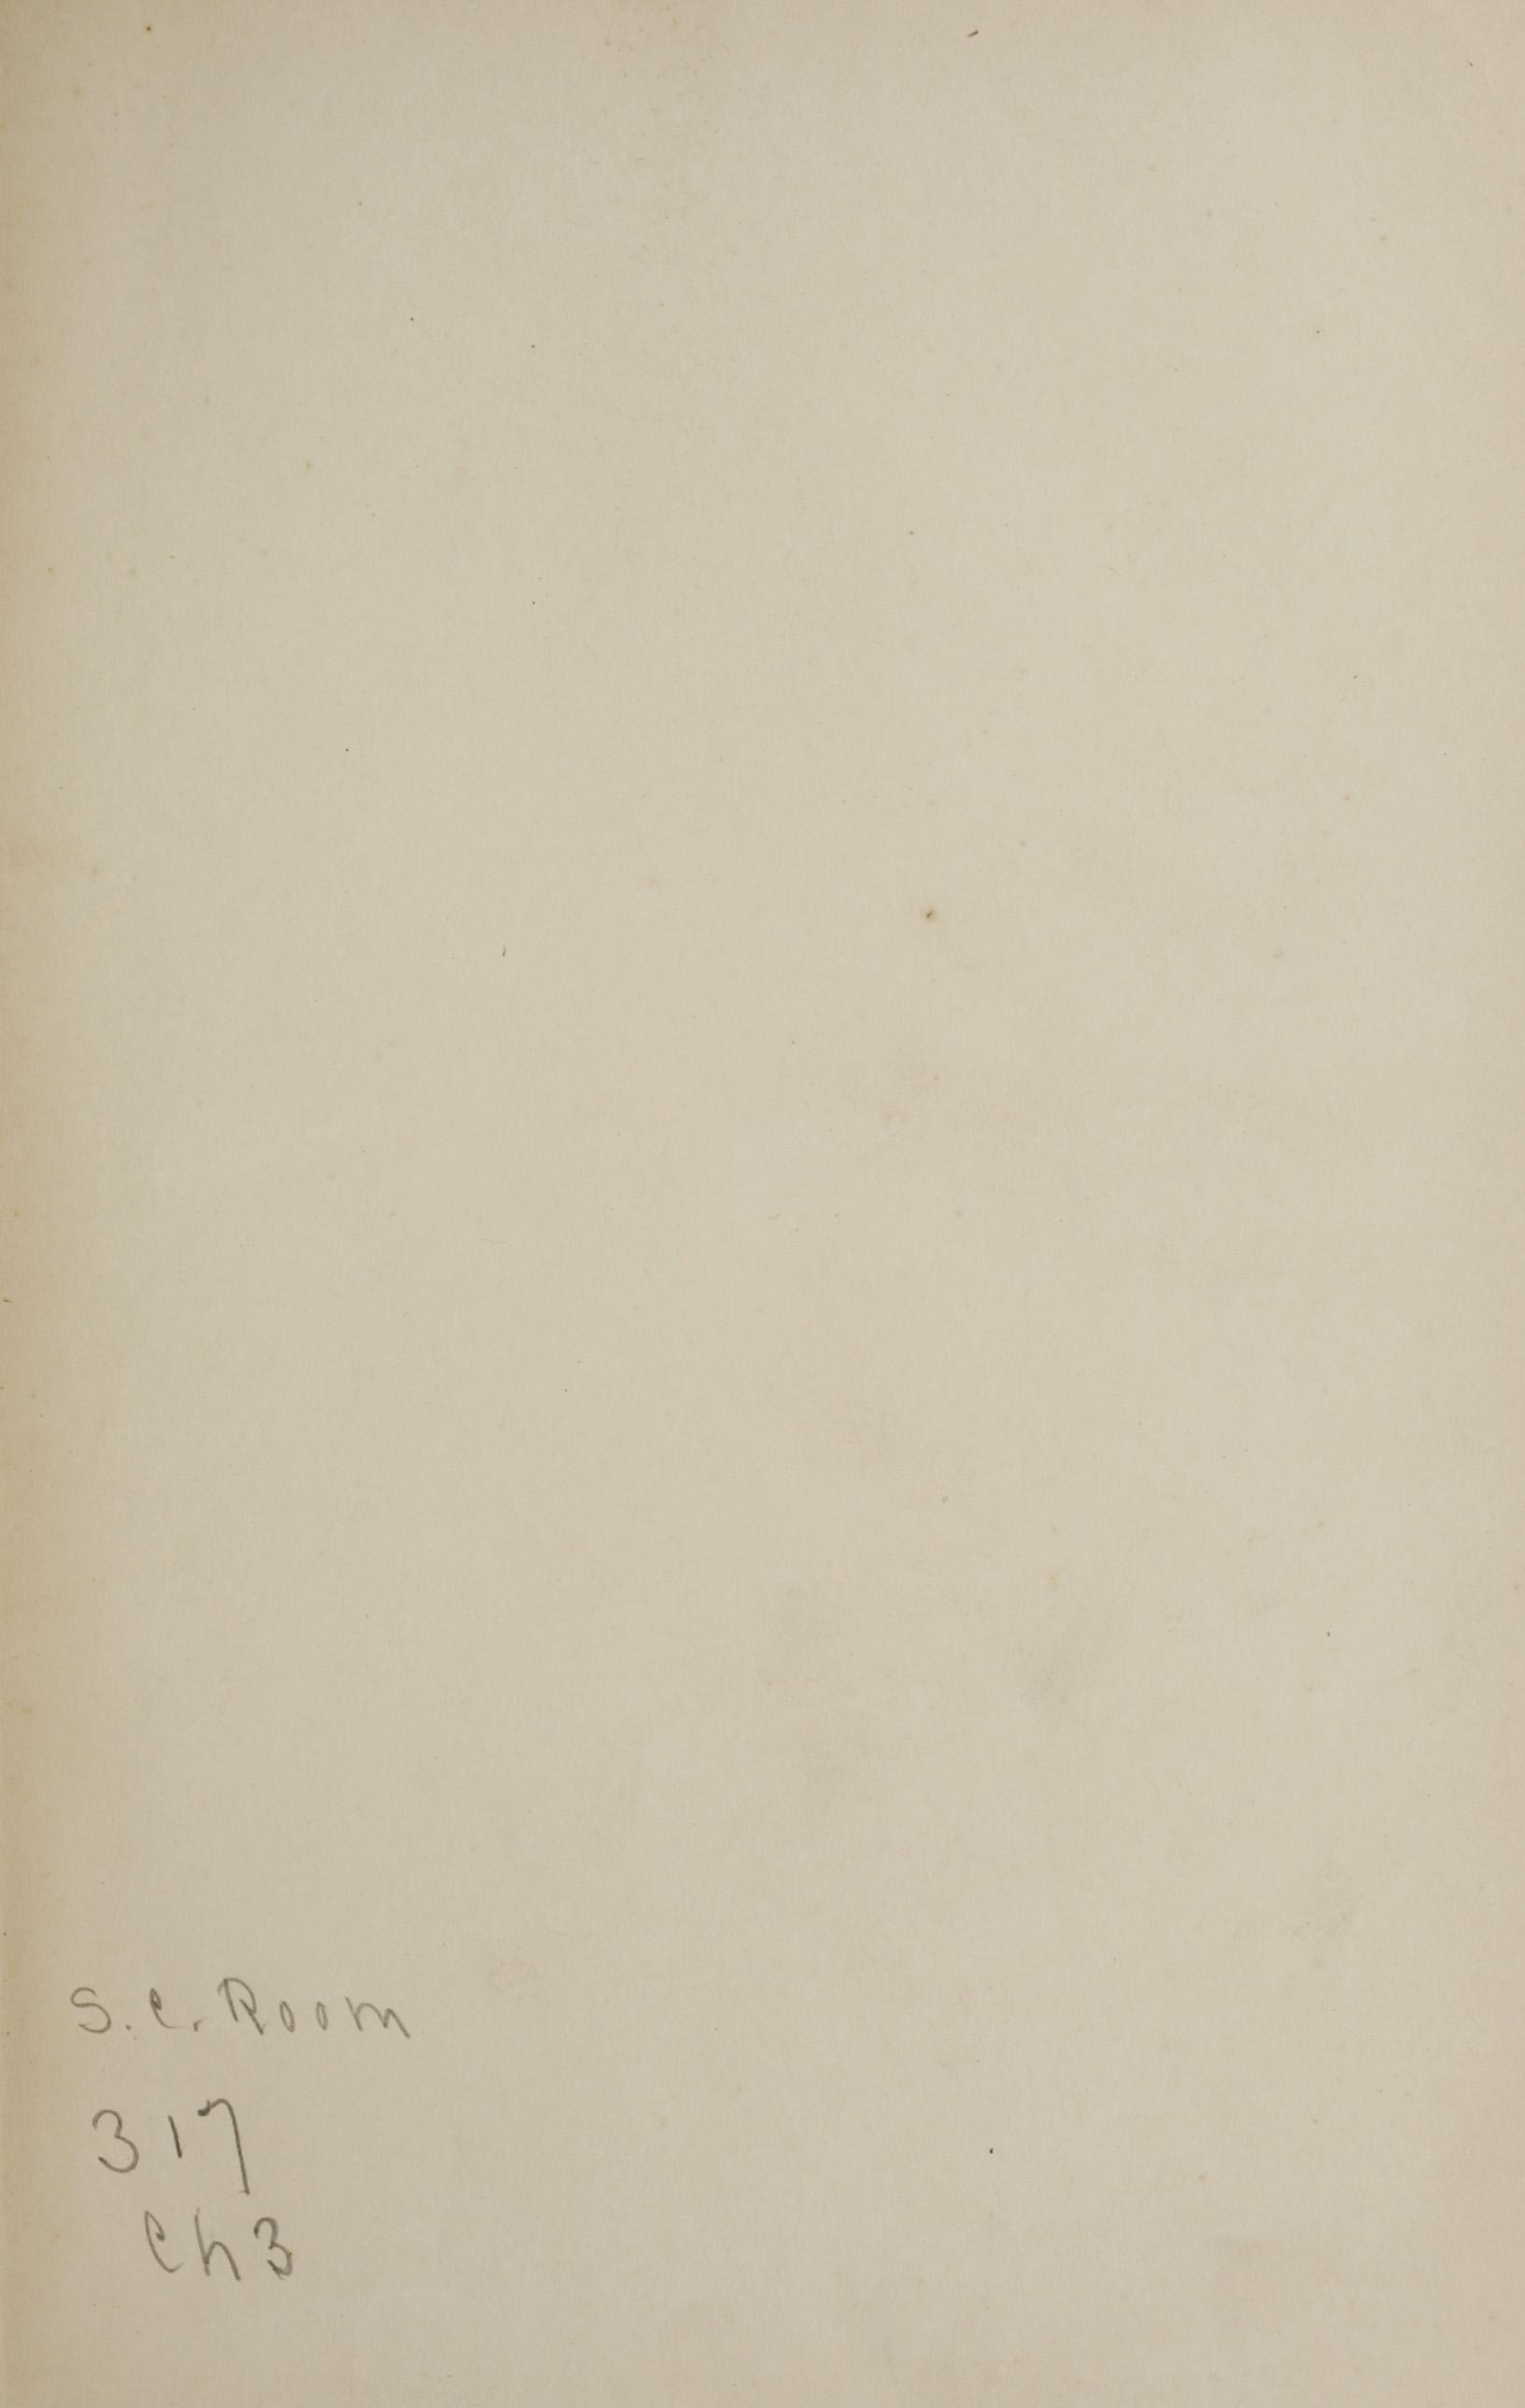 Charleston Yearbook, 1928, blank page